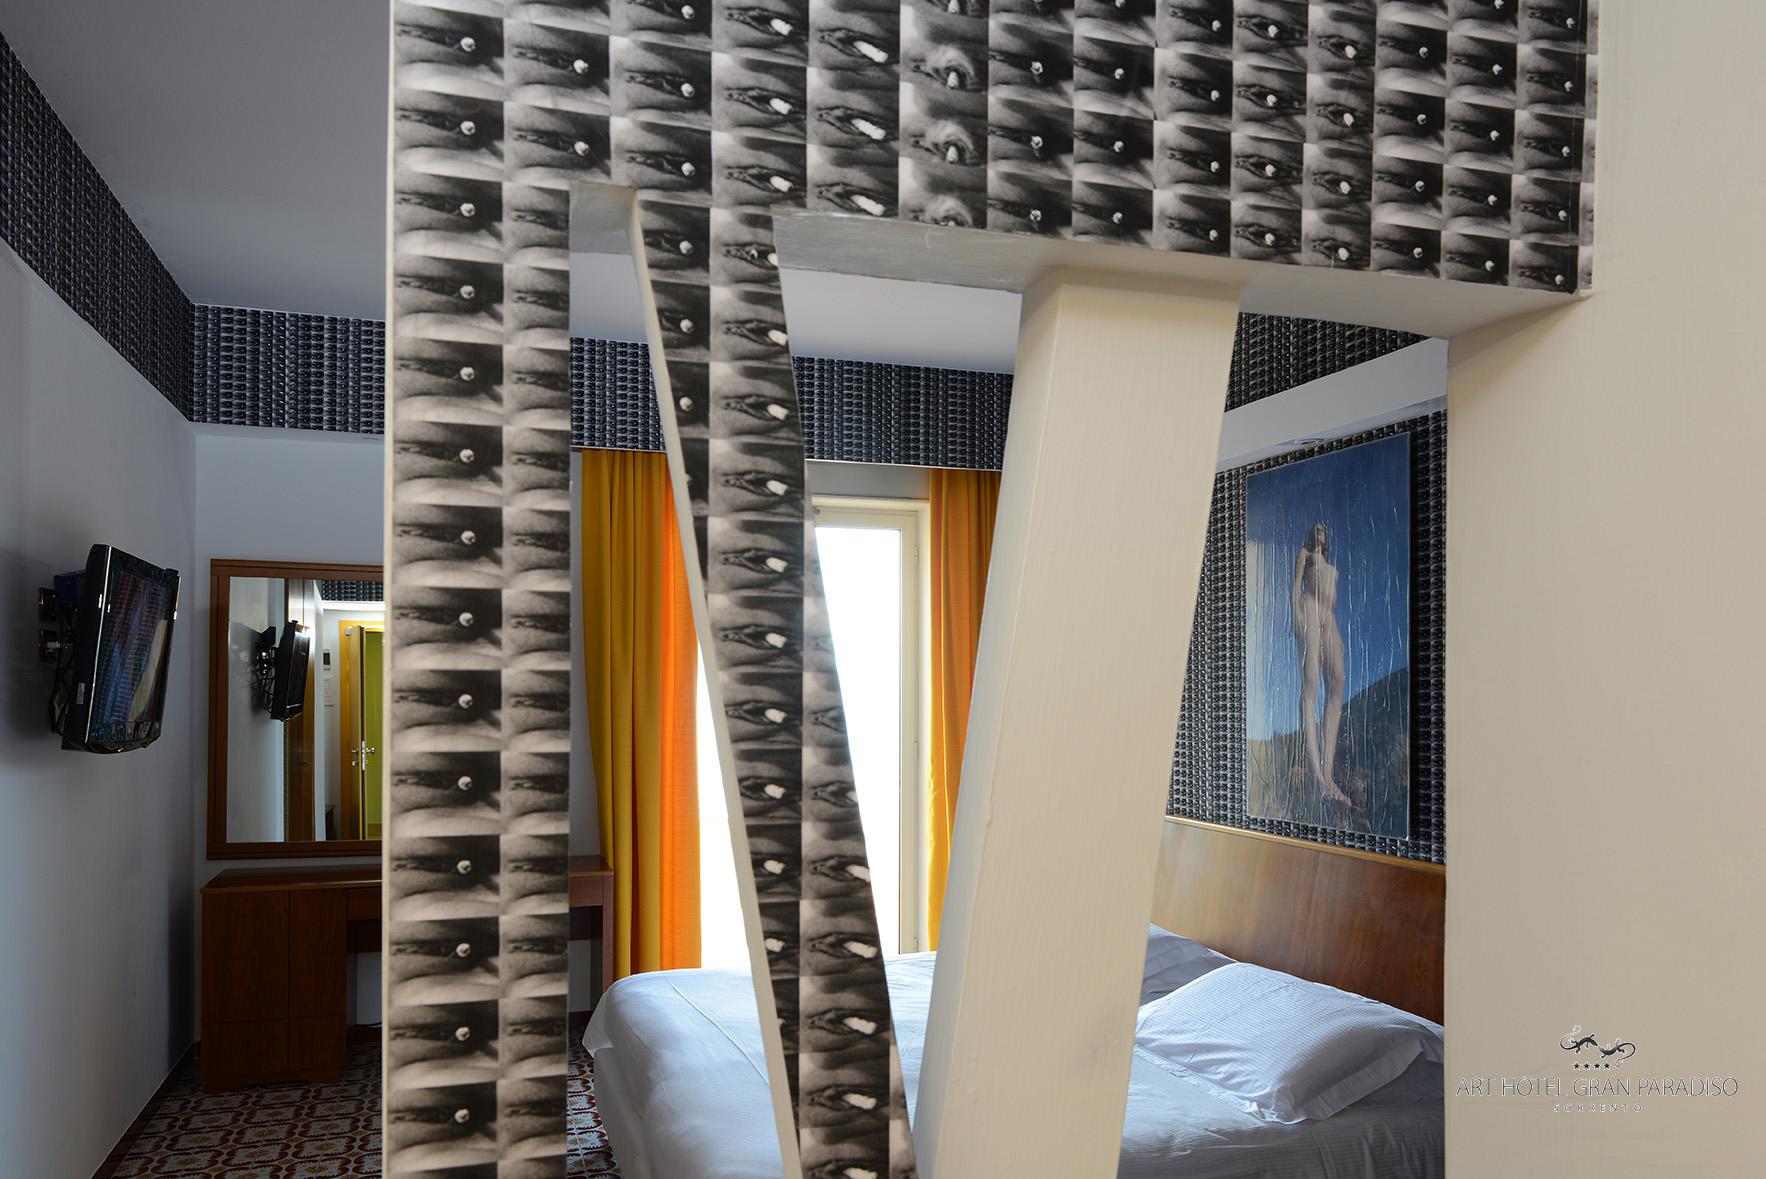 Art_Hotel_Gran_Paradiso_2013_101_Moio&Sivelli_1.jpg